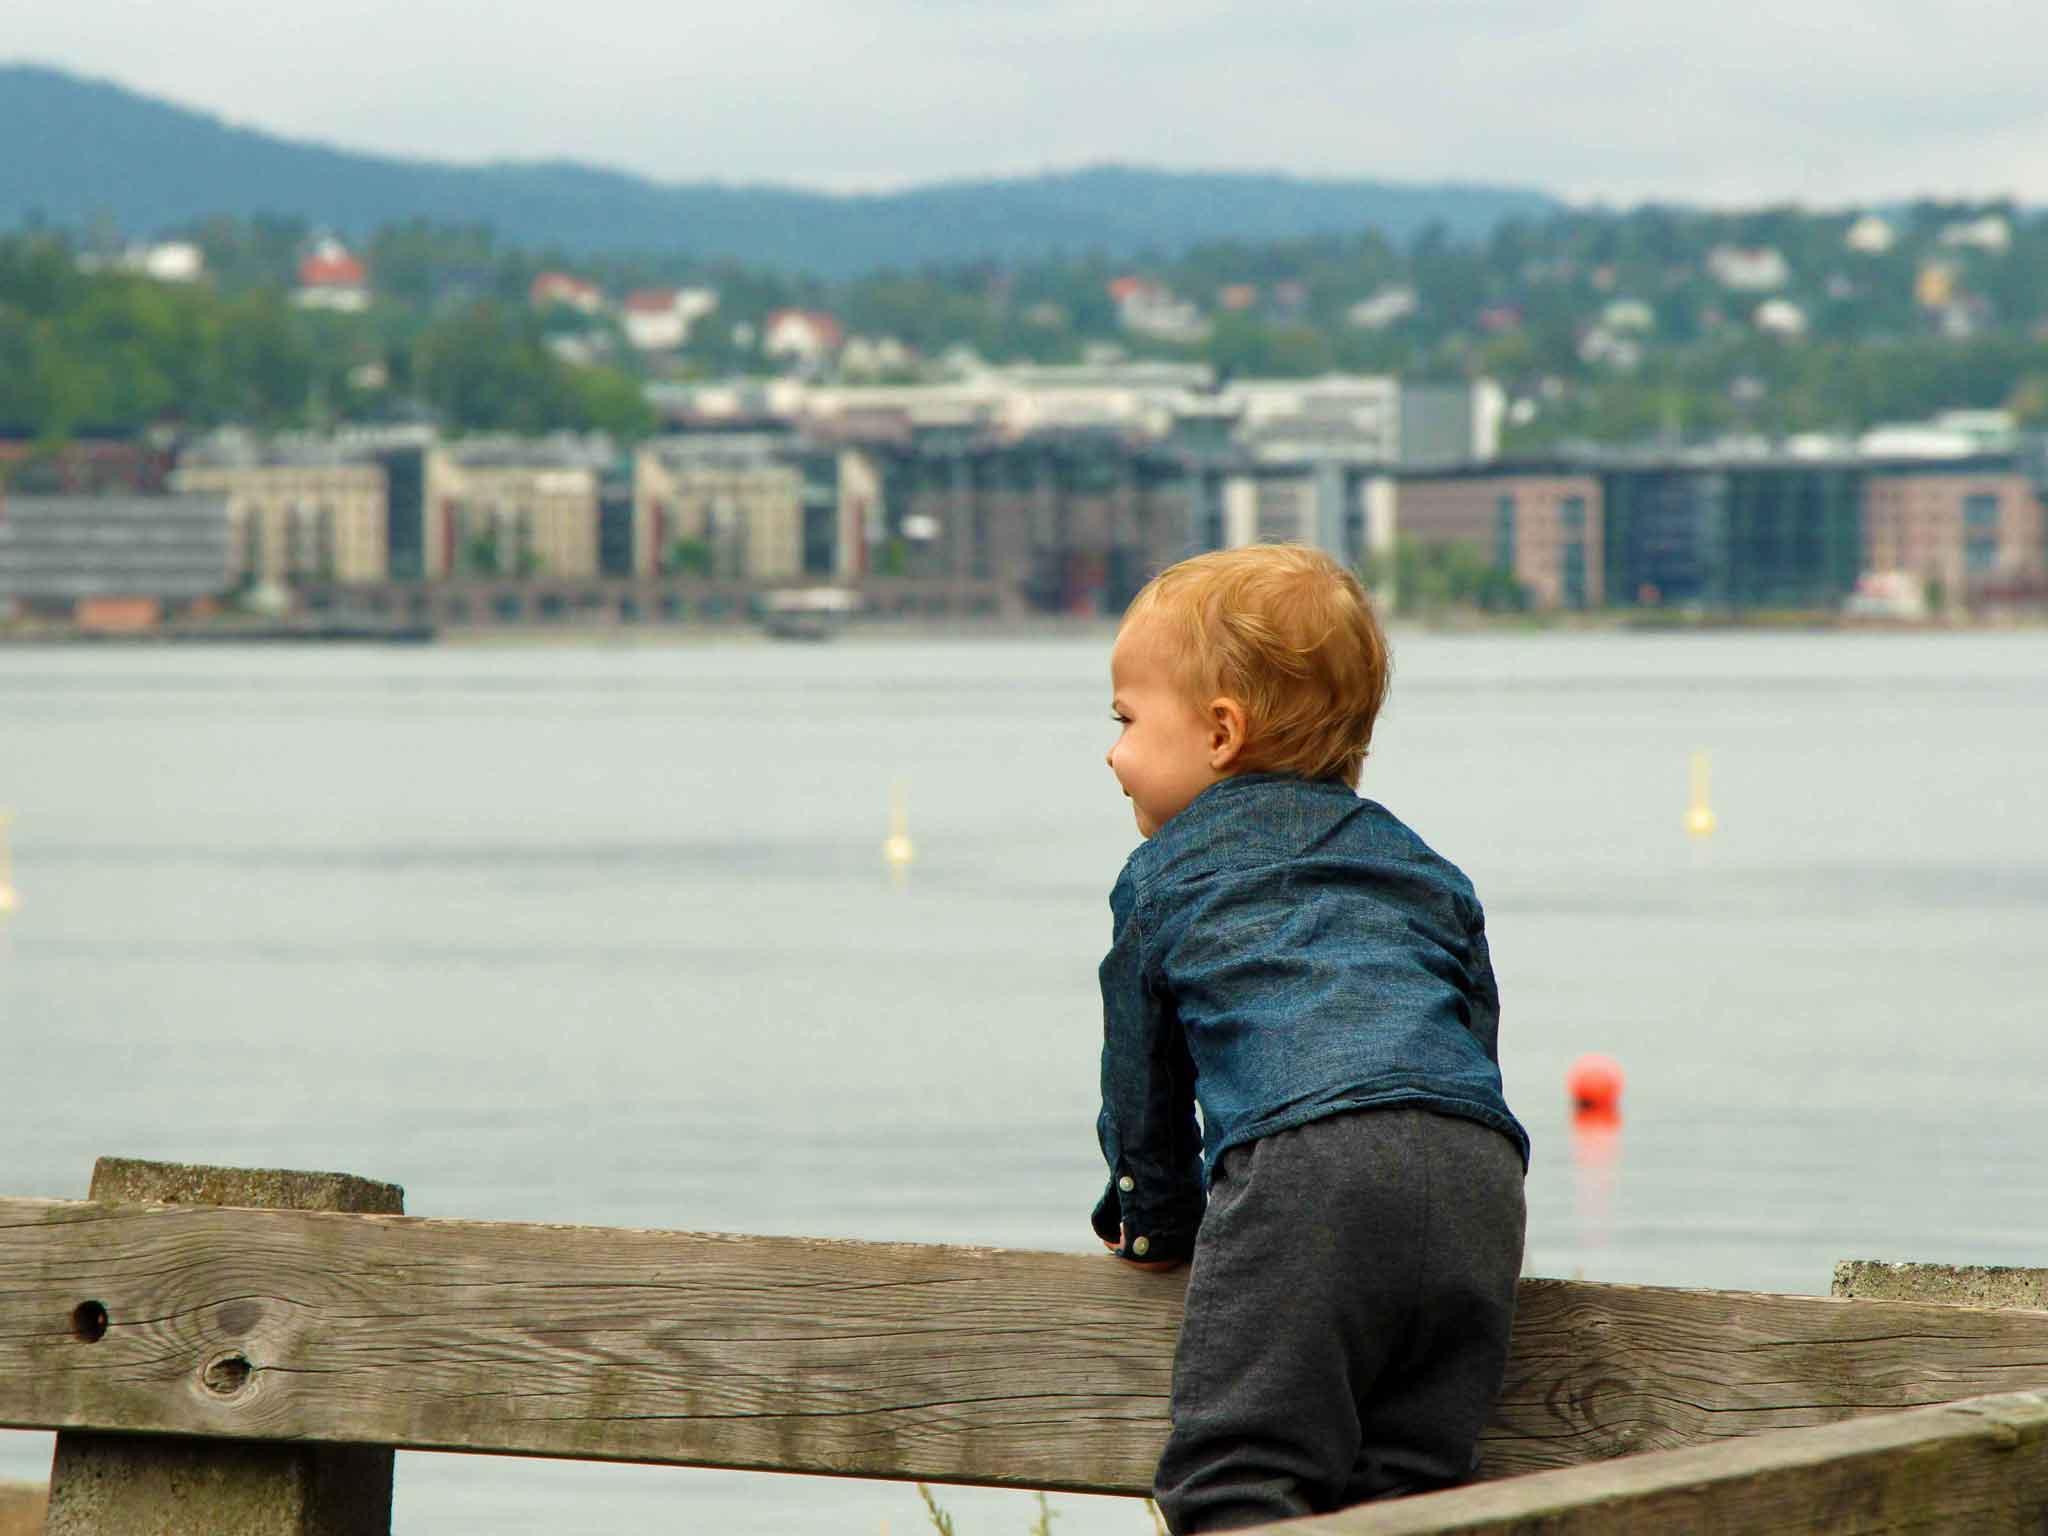 Family-Can-Travel---Oslo-Itinerary---Bygdøy-Peninsula-Oslo-Norway-(2)